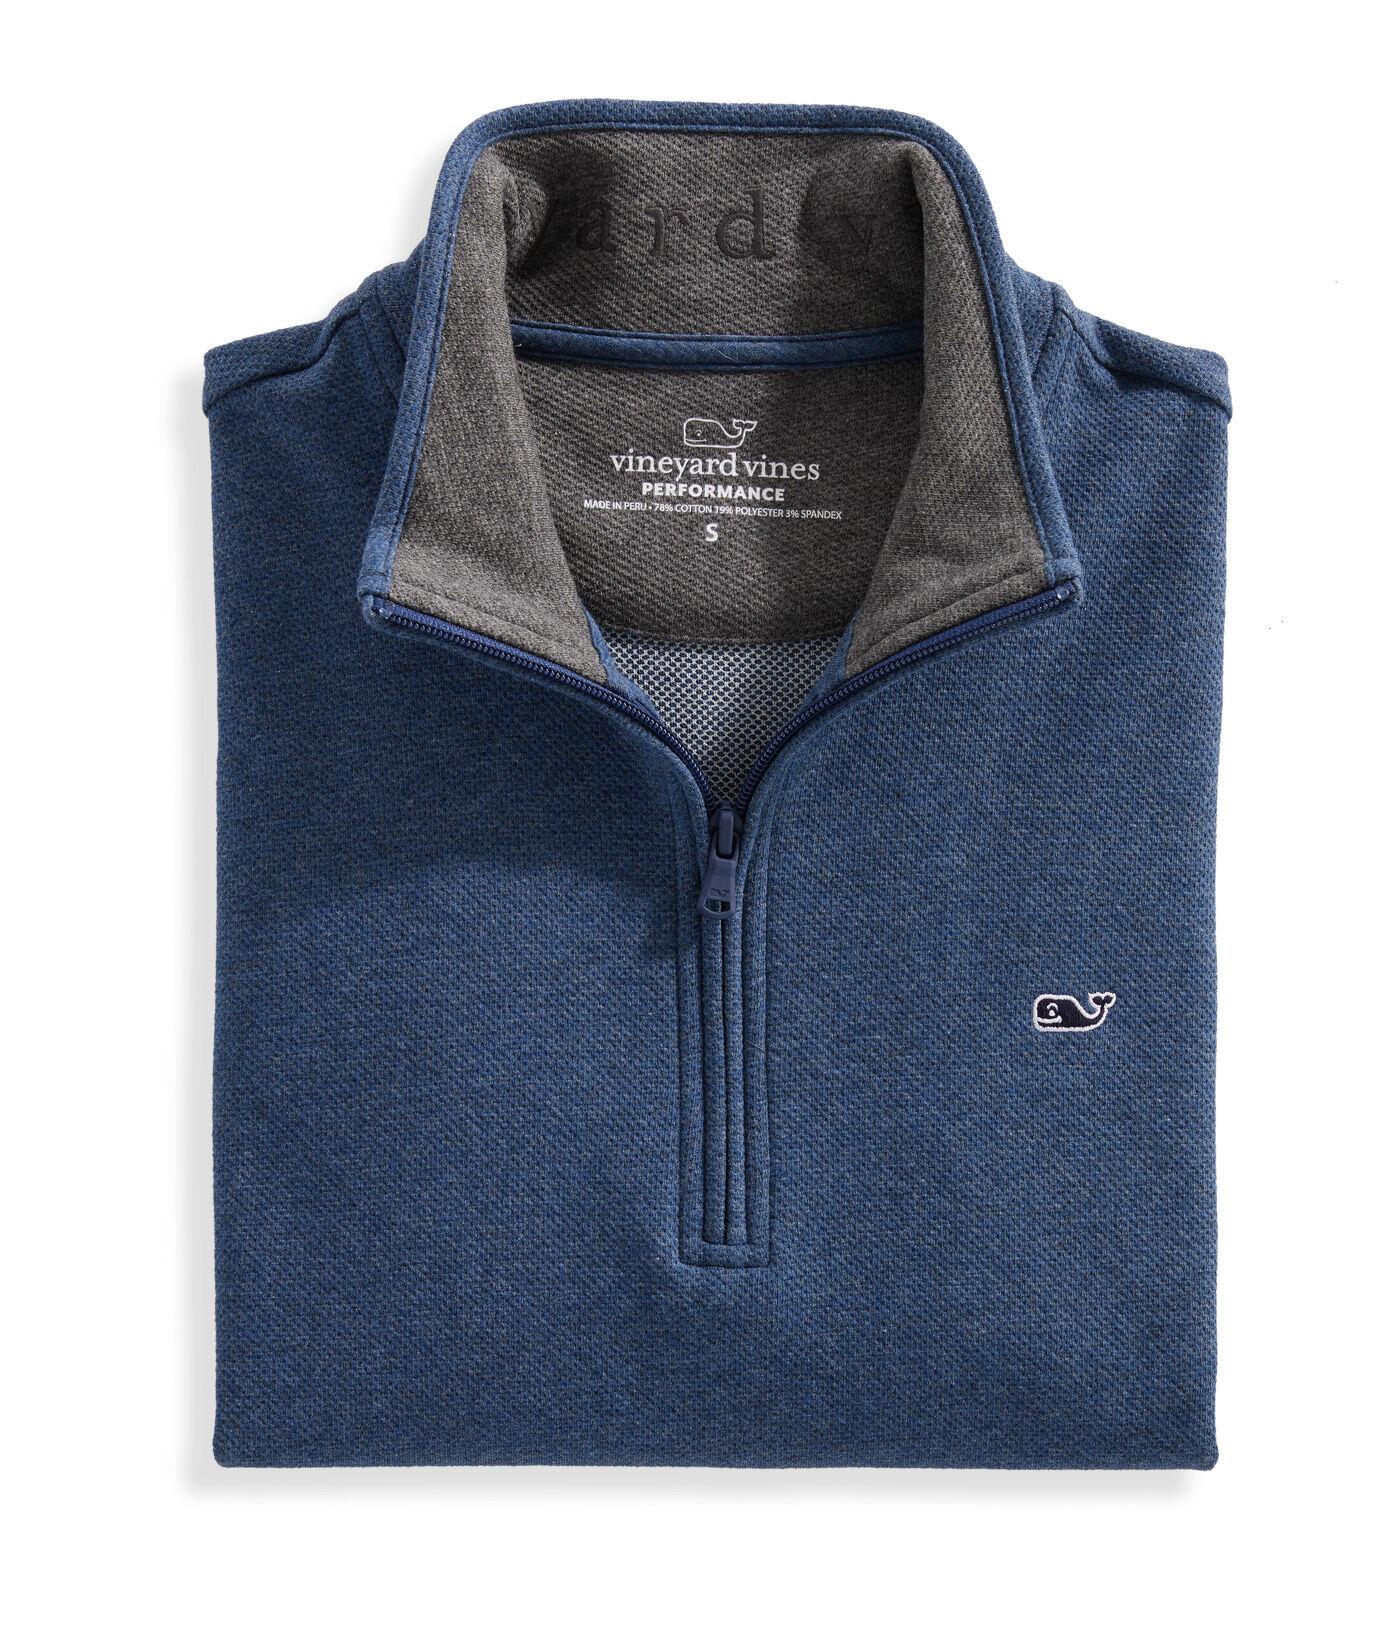 Vineyard Vines Men/'s Sweater Fleece 1//2 Zip Pullover Deep Bay Blue Shep Shirt